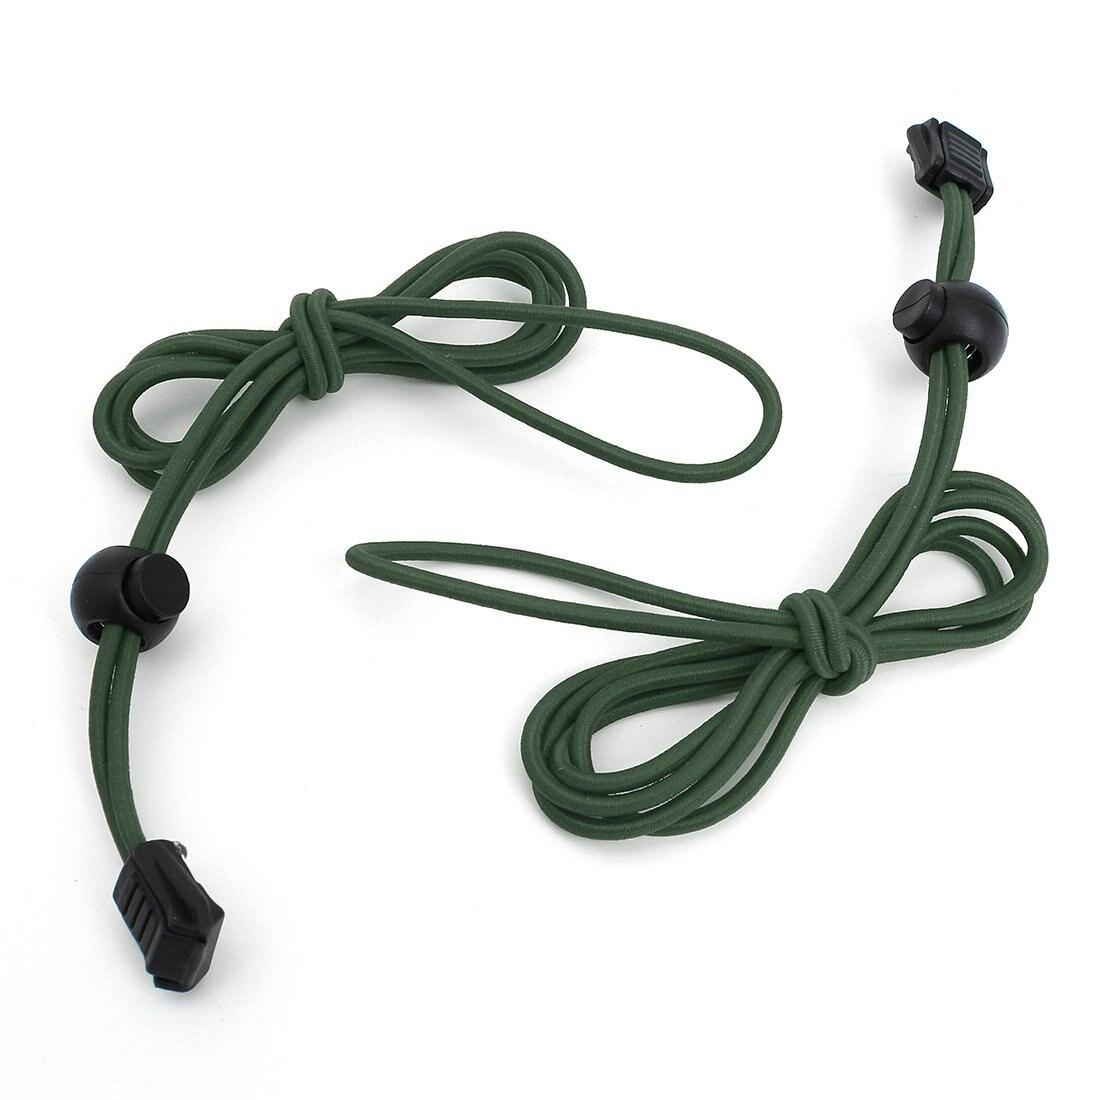 VSEN 2X Locking Shoe Laces Elastic Running Sports 110cm 1pair Dark green